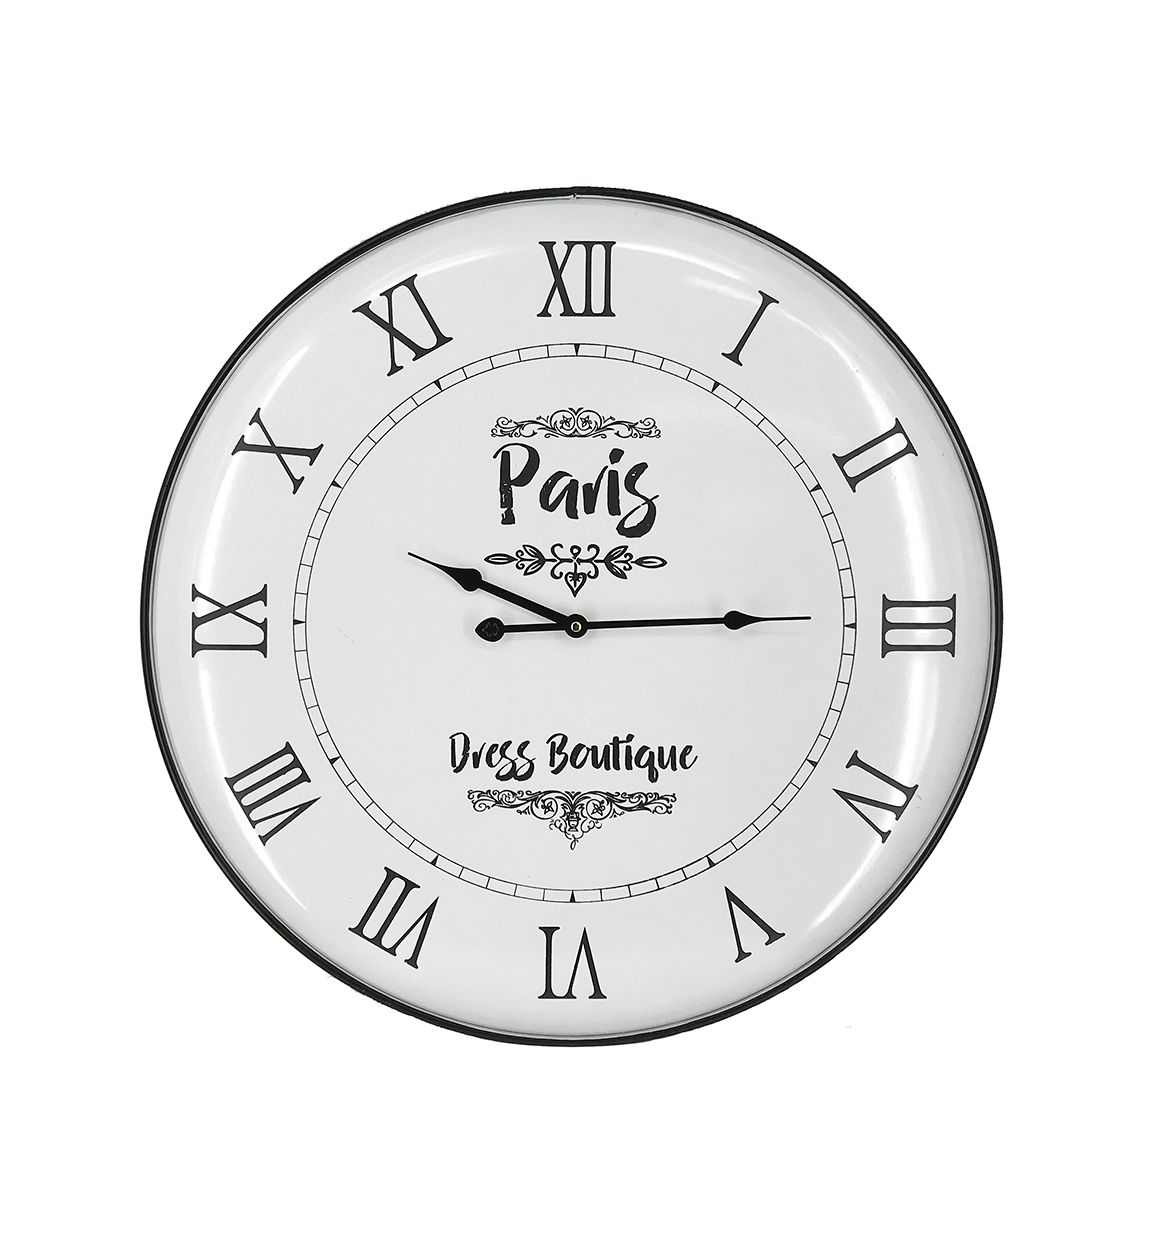 Ceas de perete Gales Boutique Alb / Negru, Ø62 cm